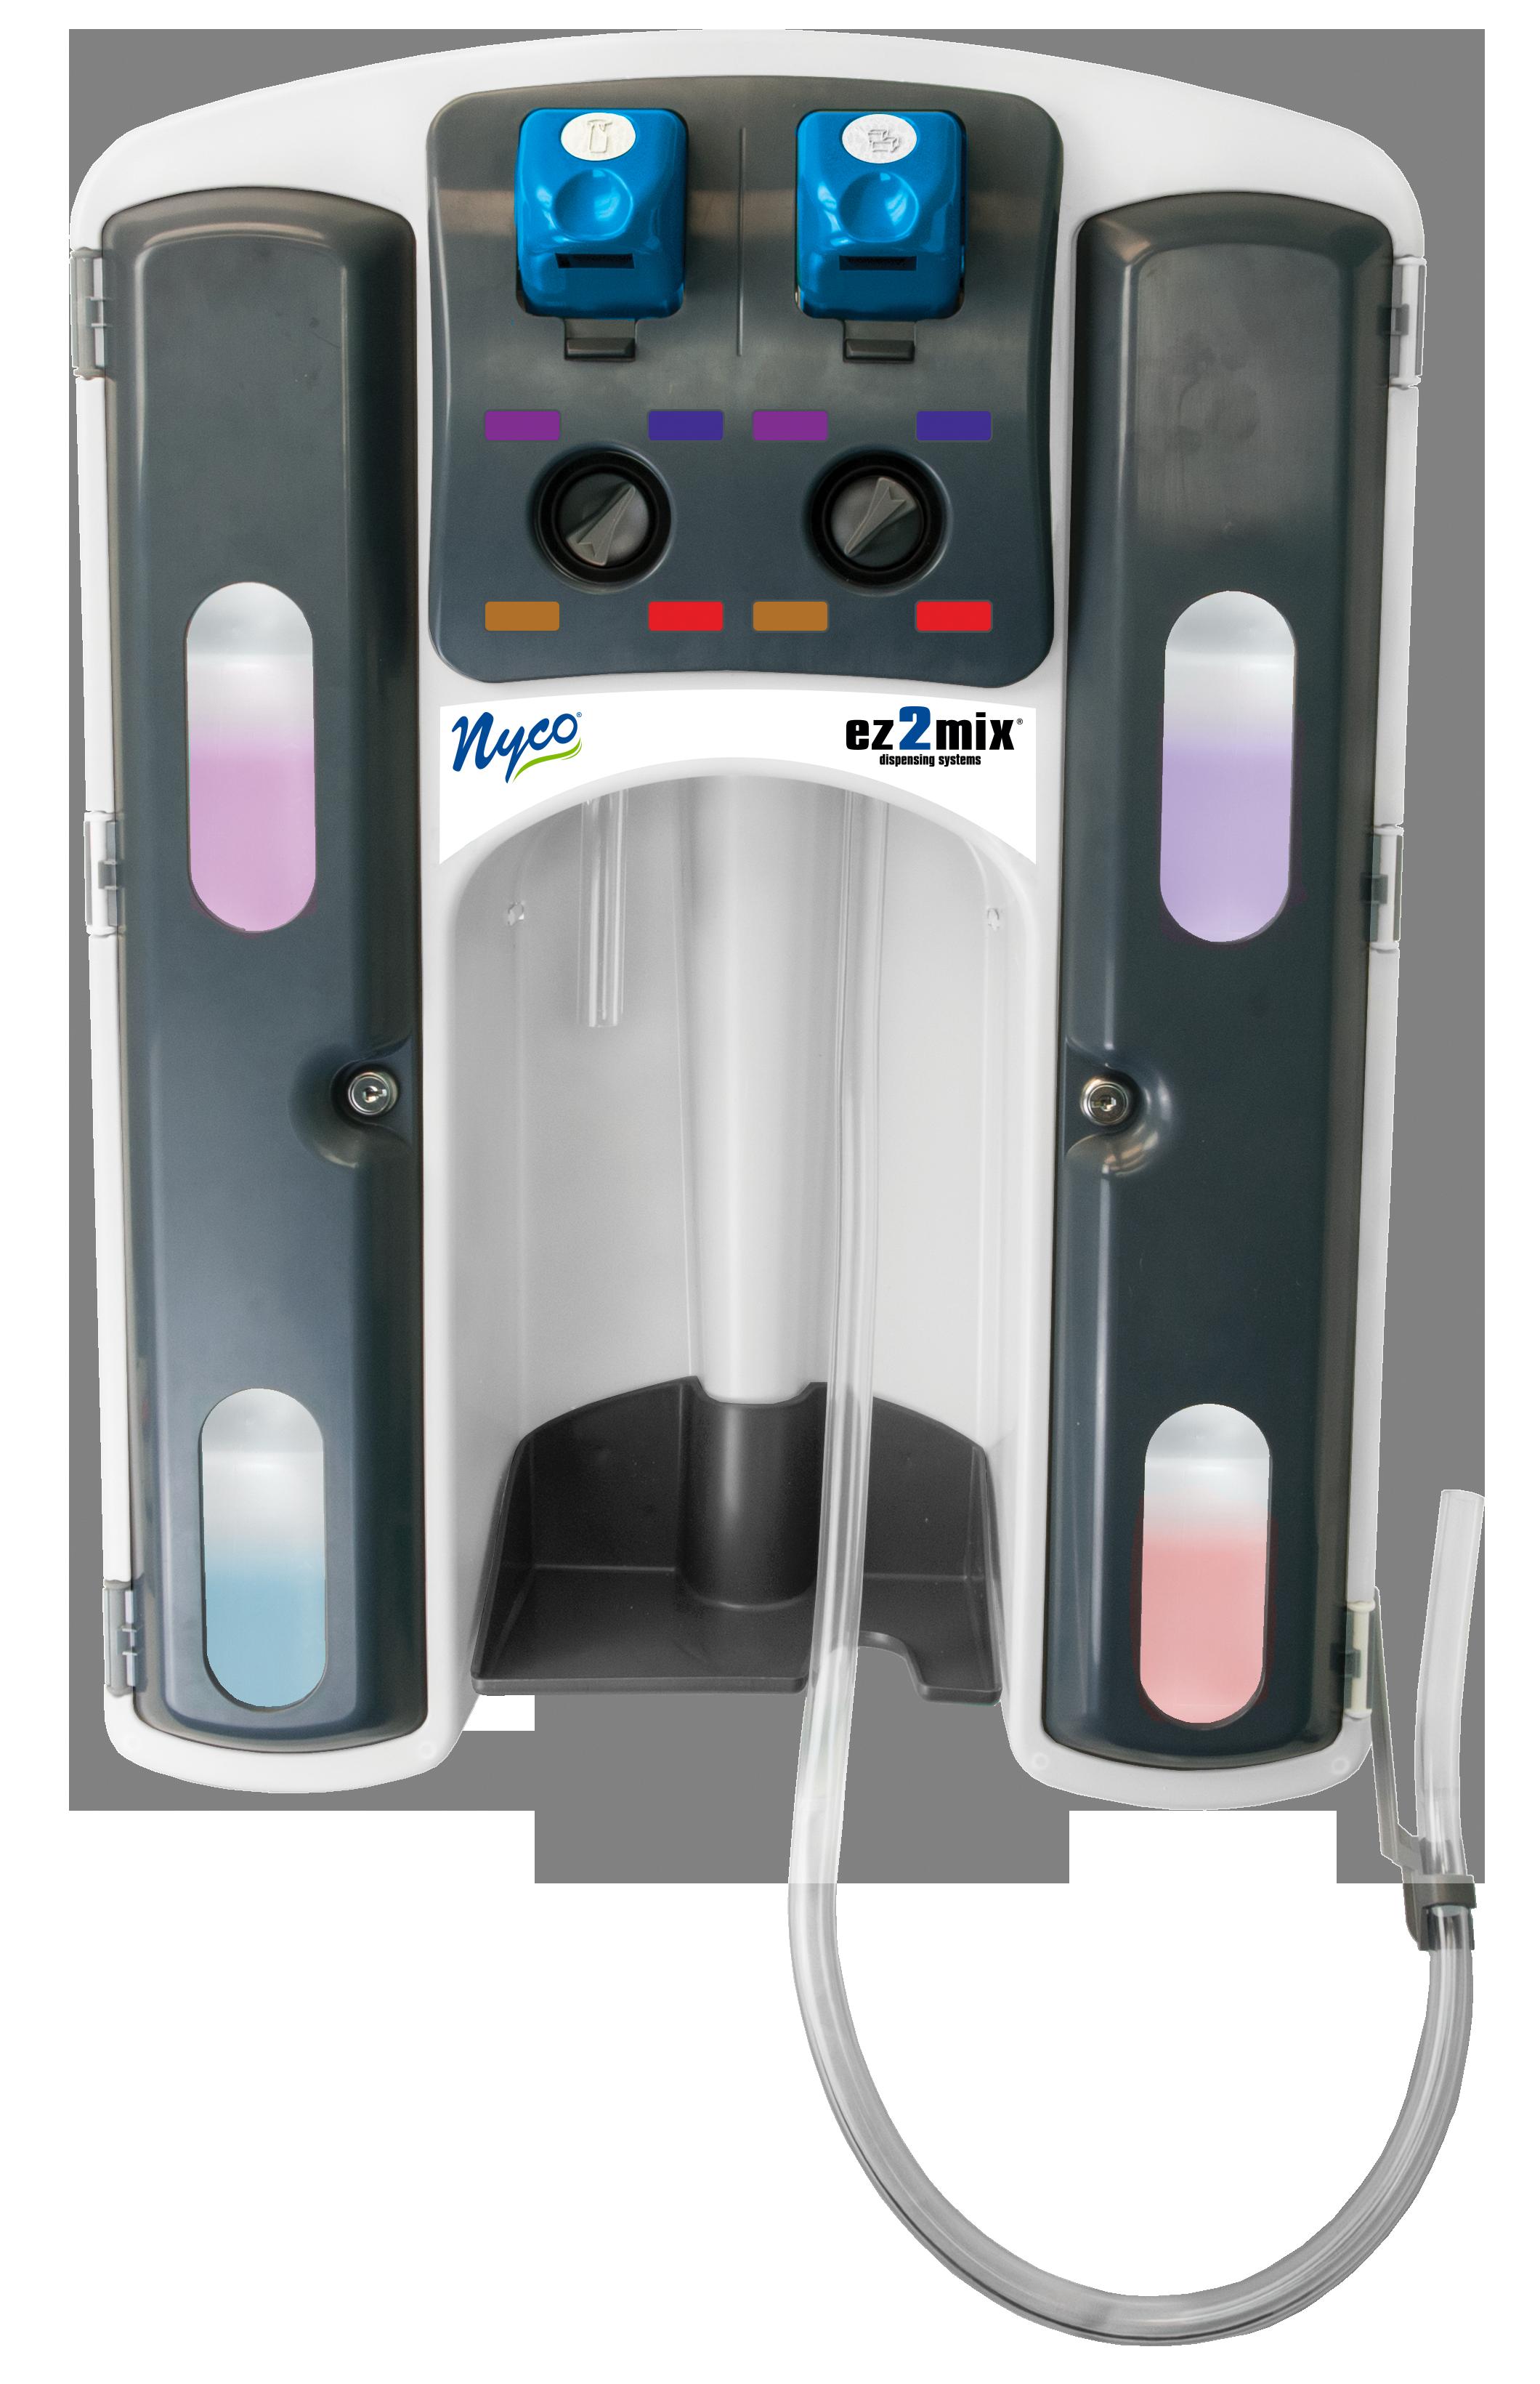 Nyco DSP-9363 locking cabinet dispenser